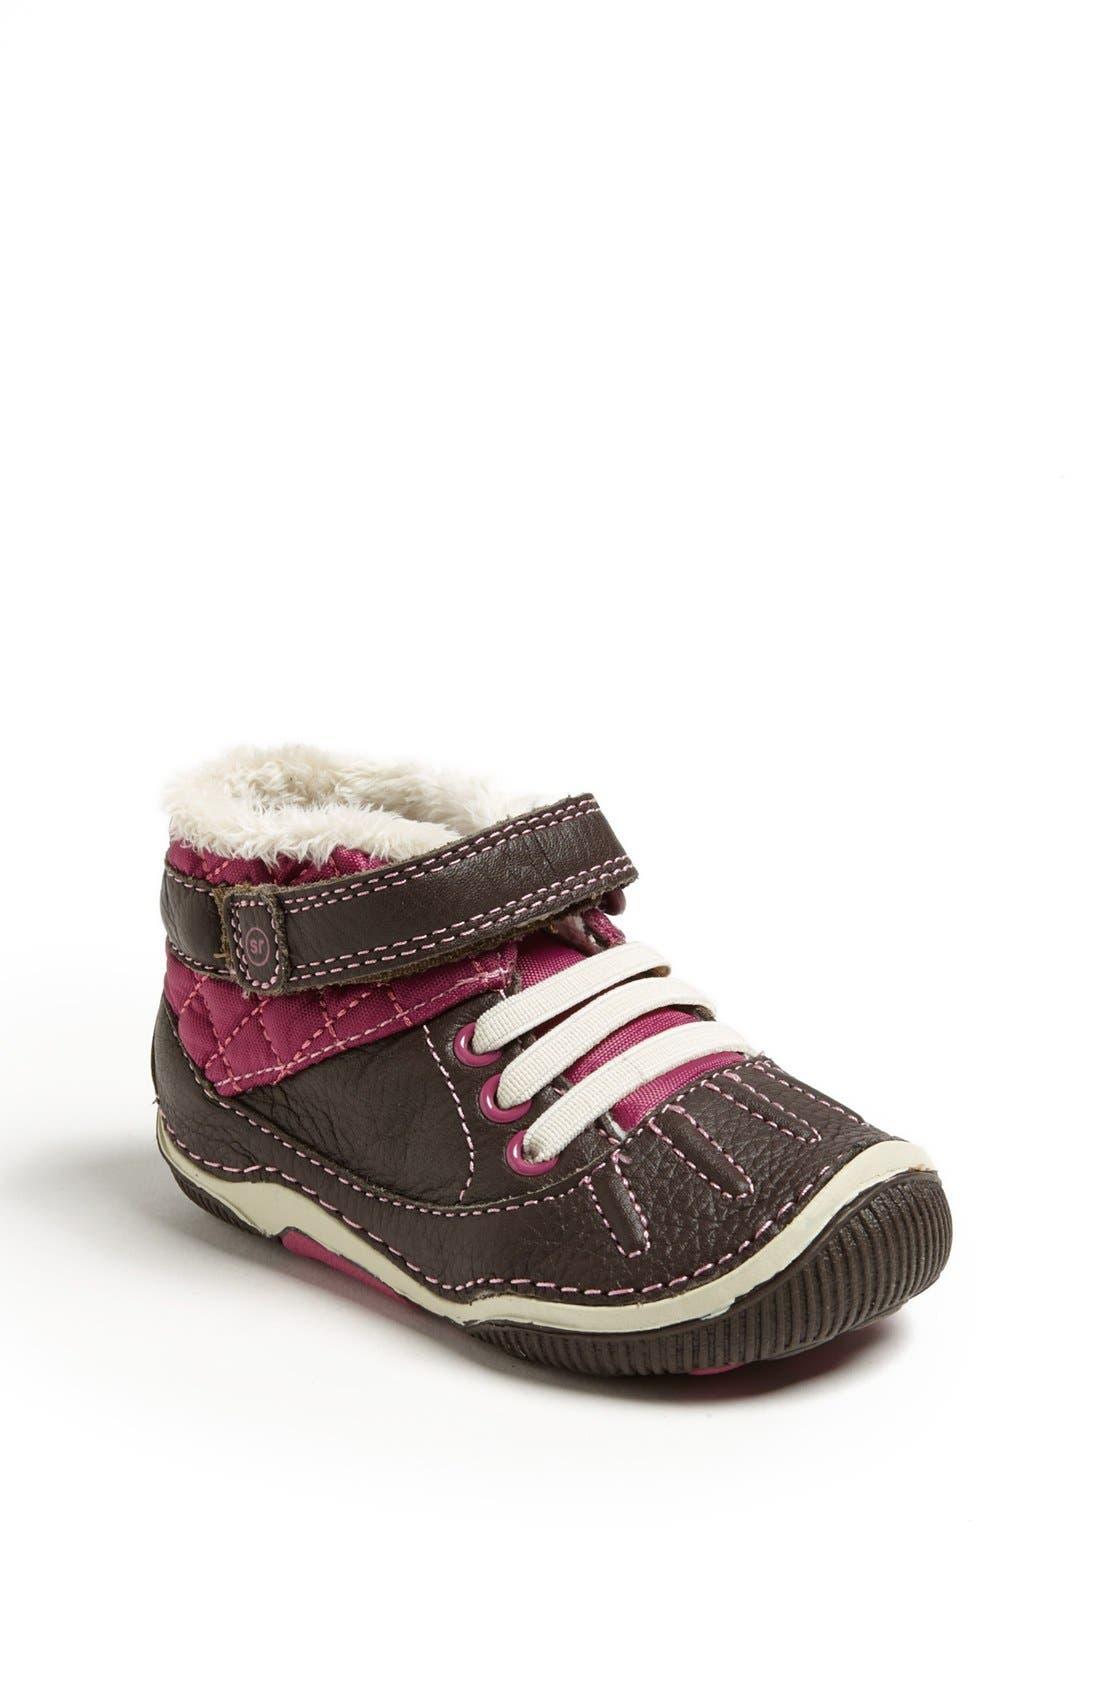 Alternate Image 1 Selected - Stride Rite 'Dakota' Sneaker (Baby, Walker & Toddler)